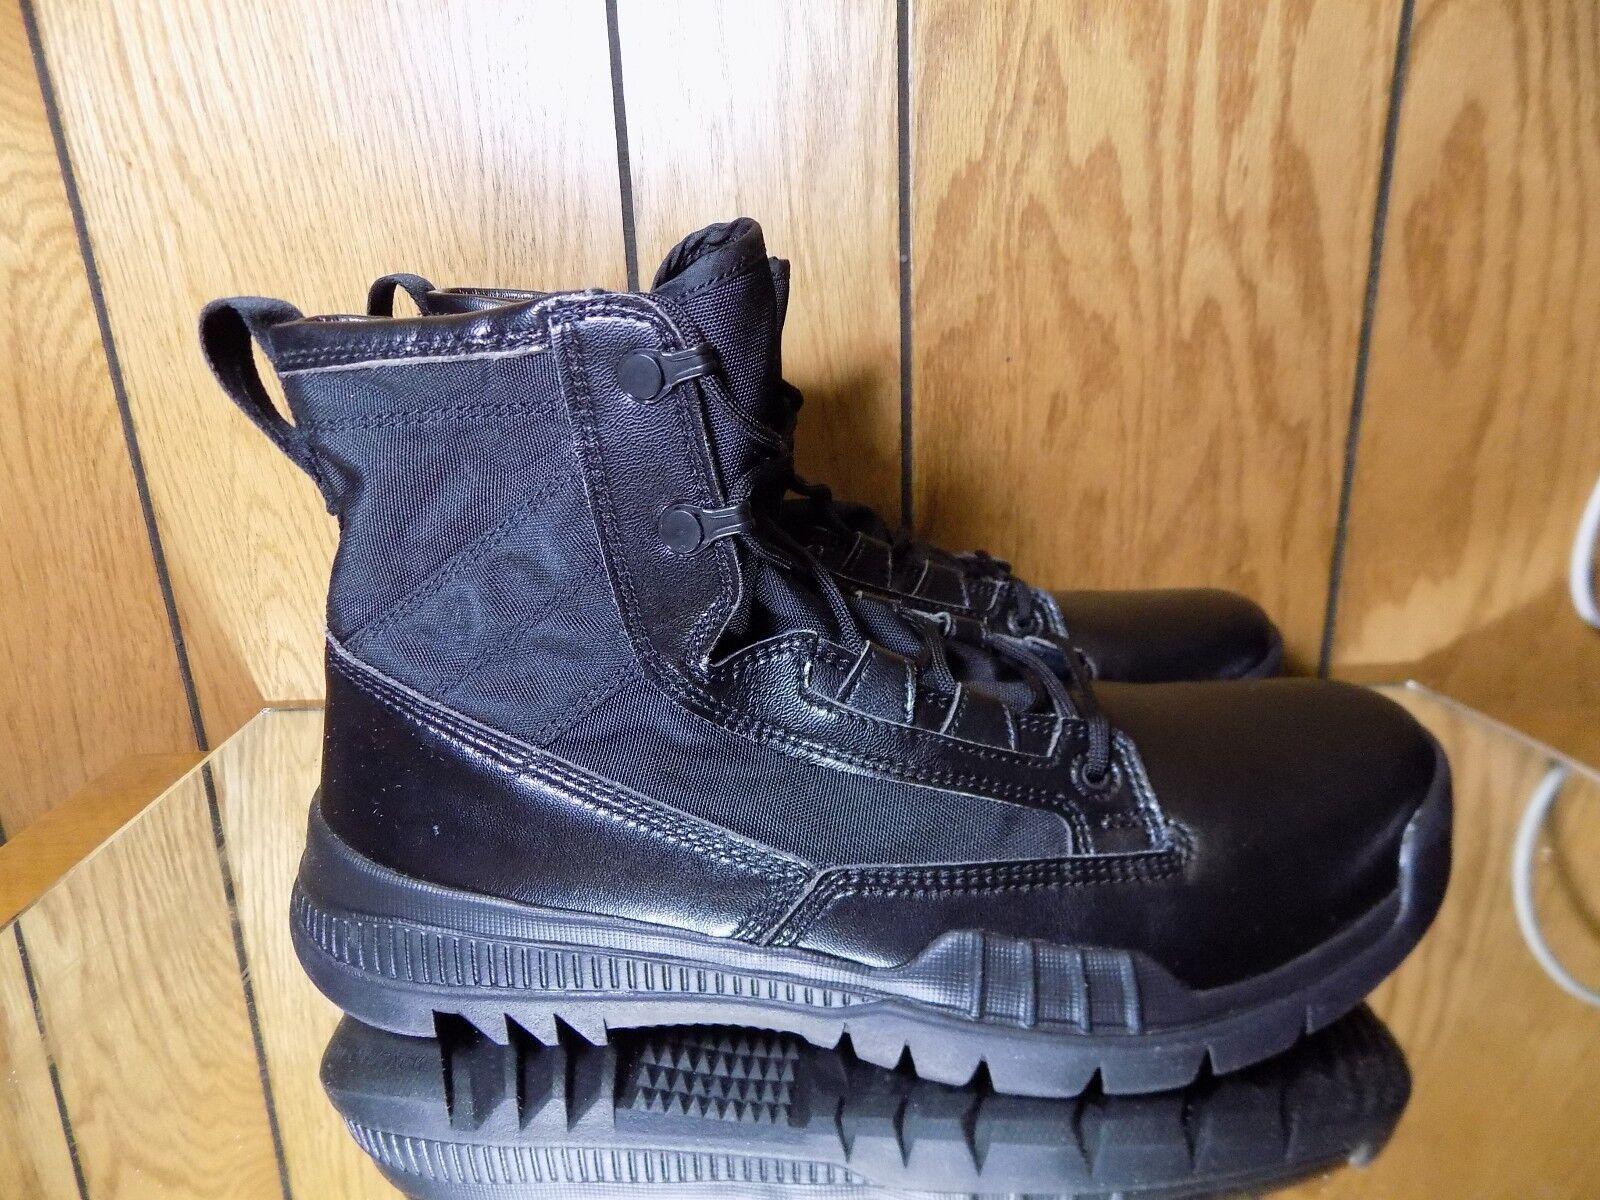 NIKE SFB Field 6 Triple Black Boots First Responder 631360 090 s. 9.5 NEW